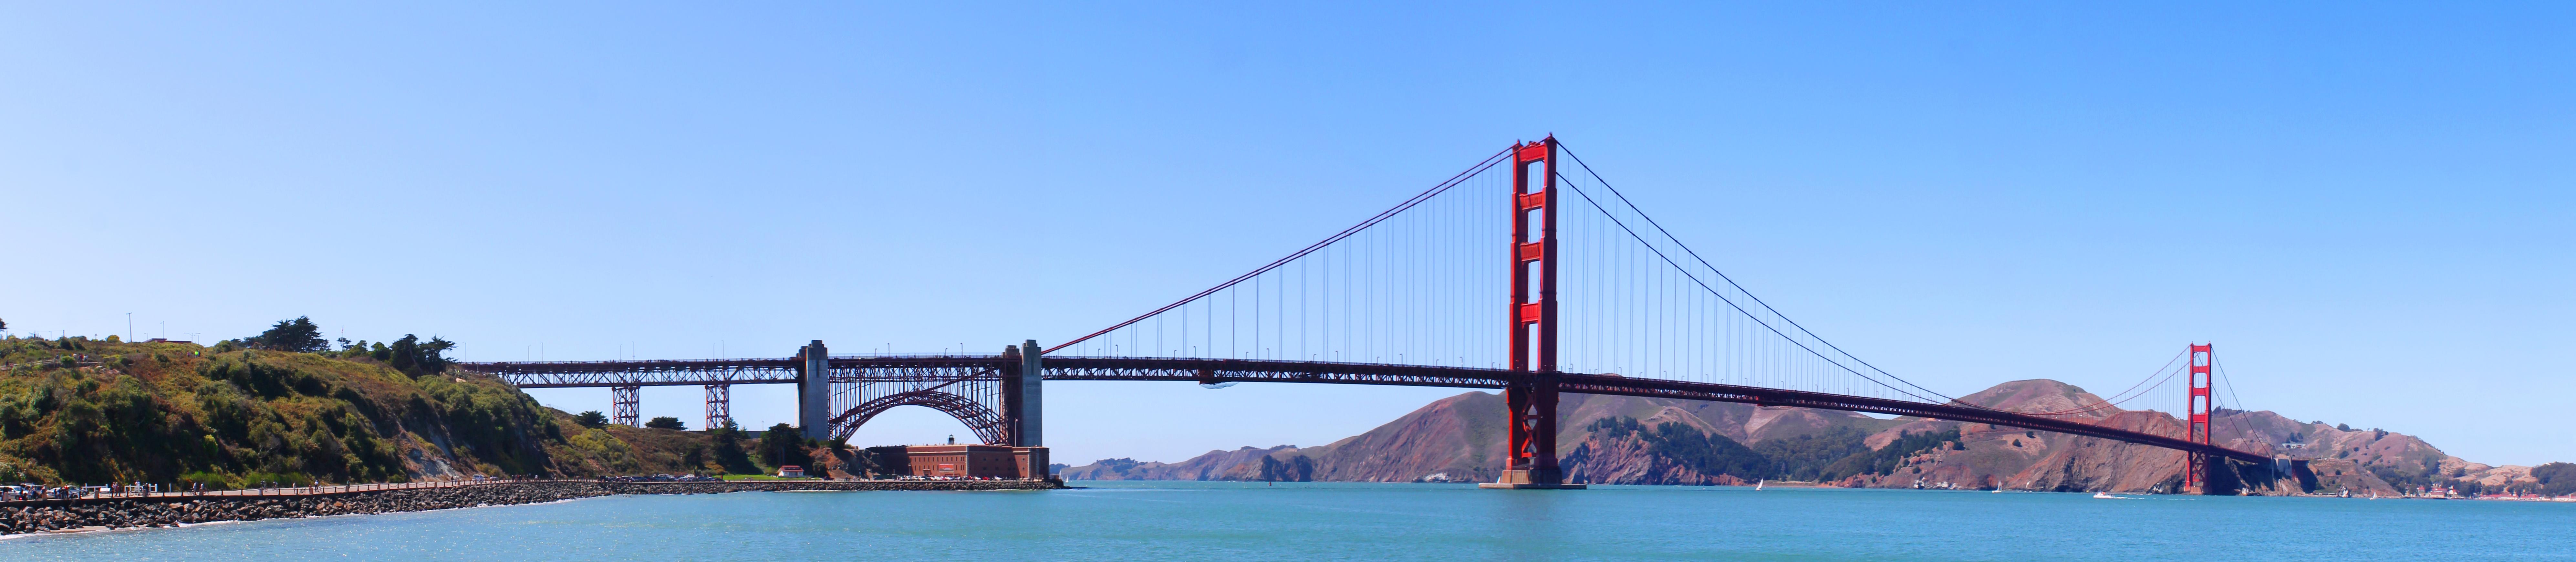 Description golden gate bridge panorama photo